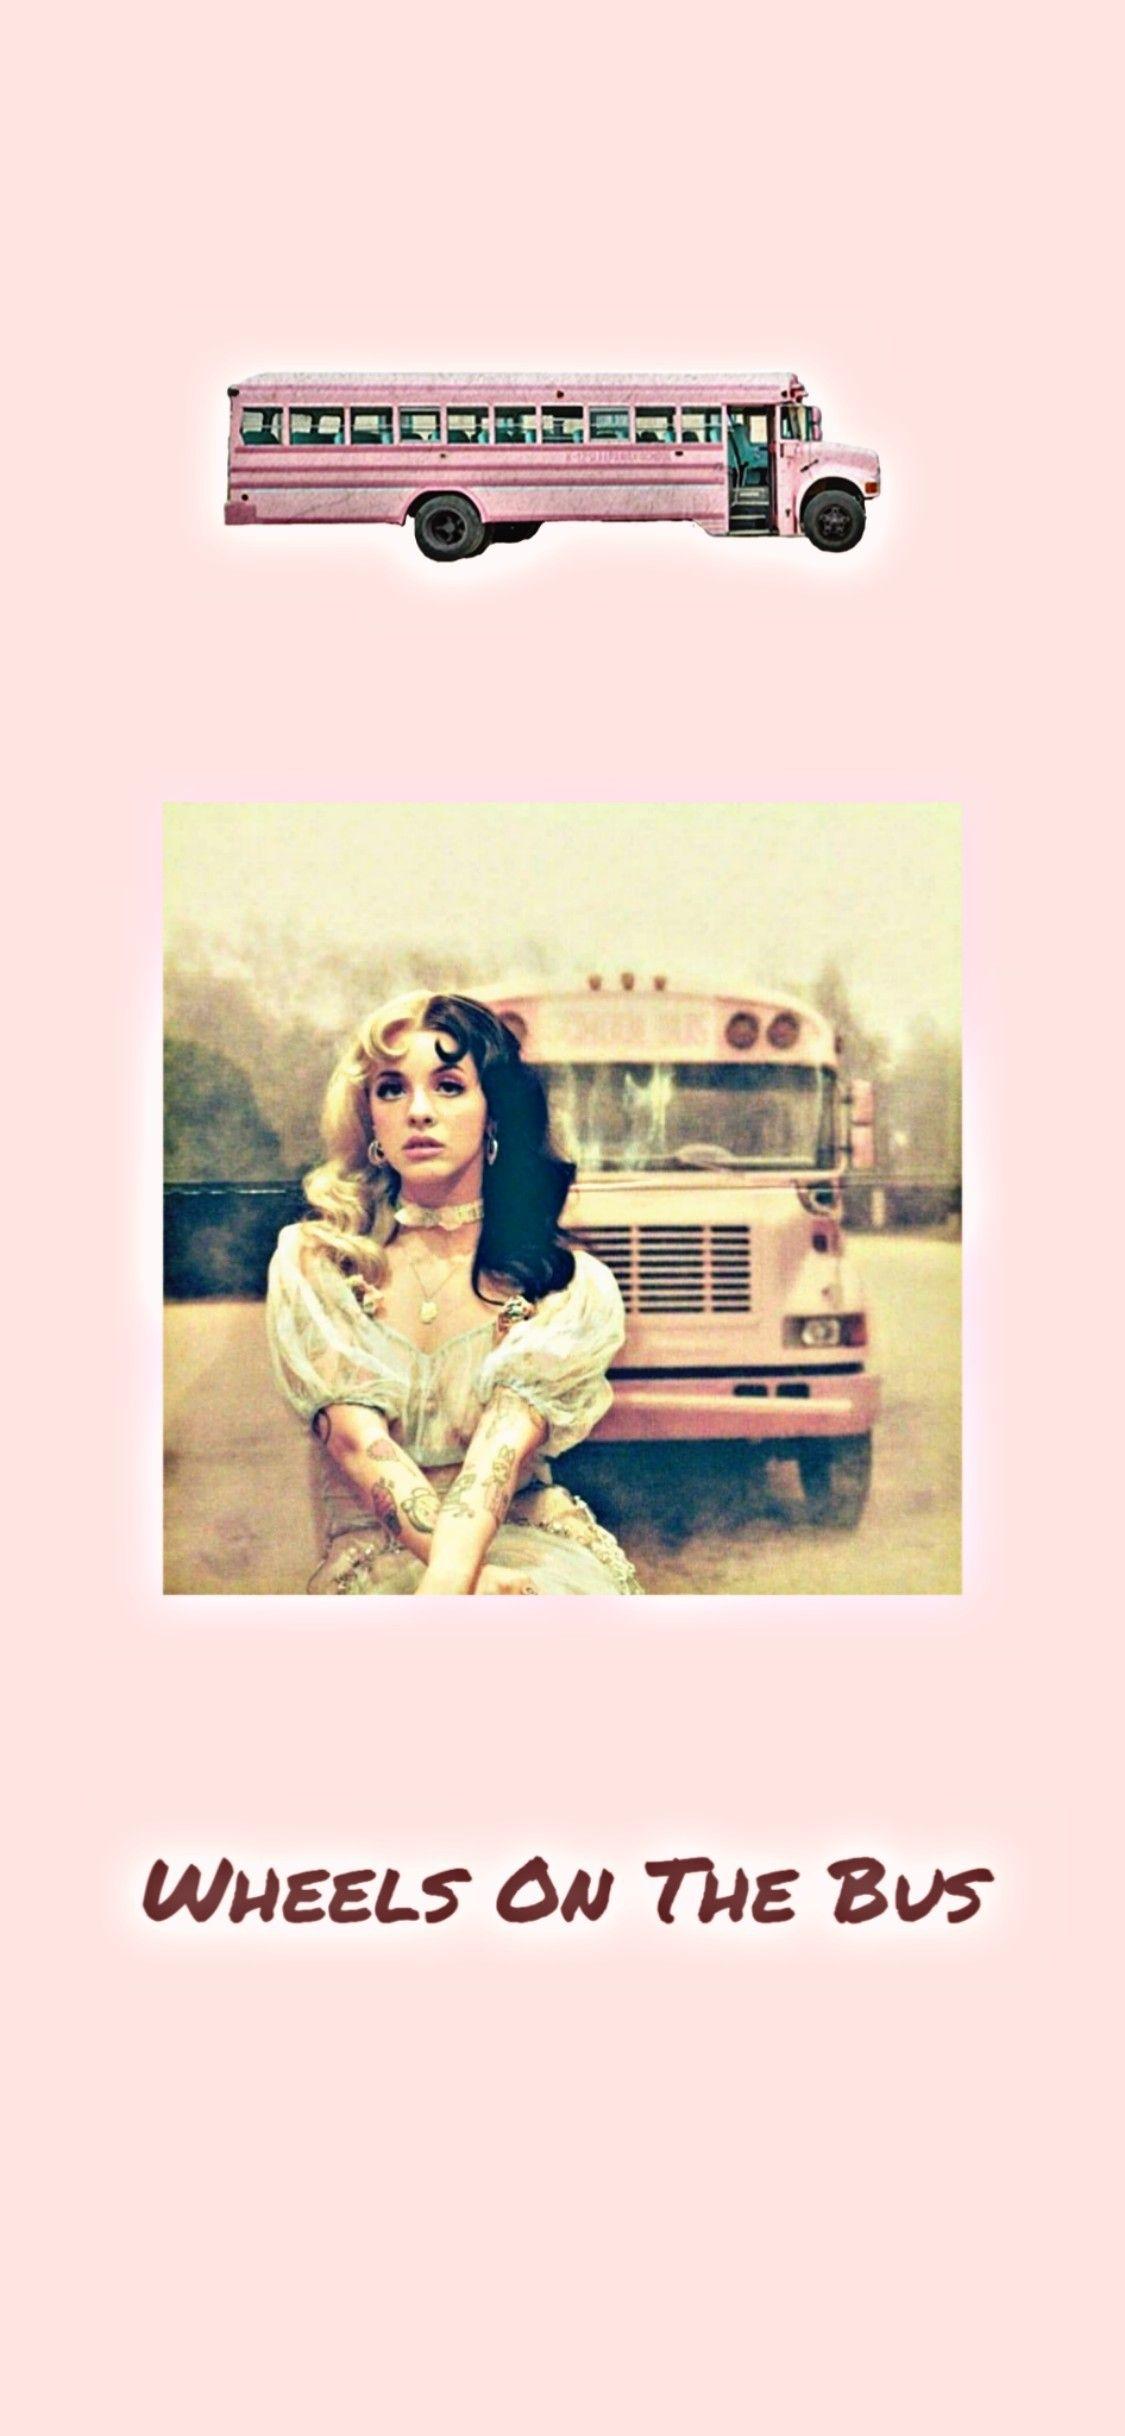 Wheels On The Bus Melanie Martinez Lyrics Melanie Martinez Wheels On The Bus